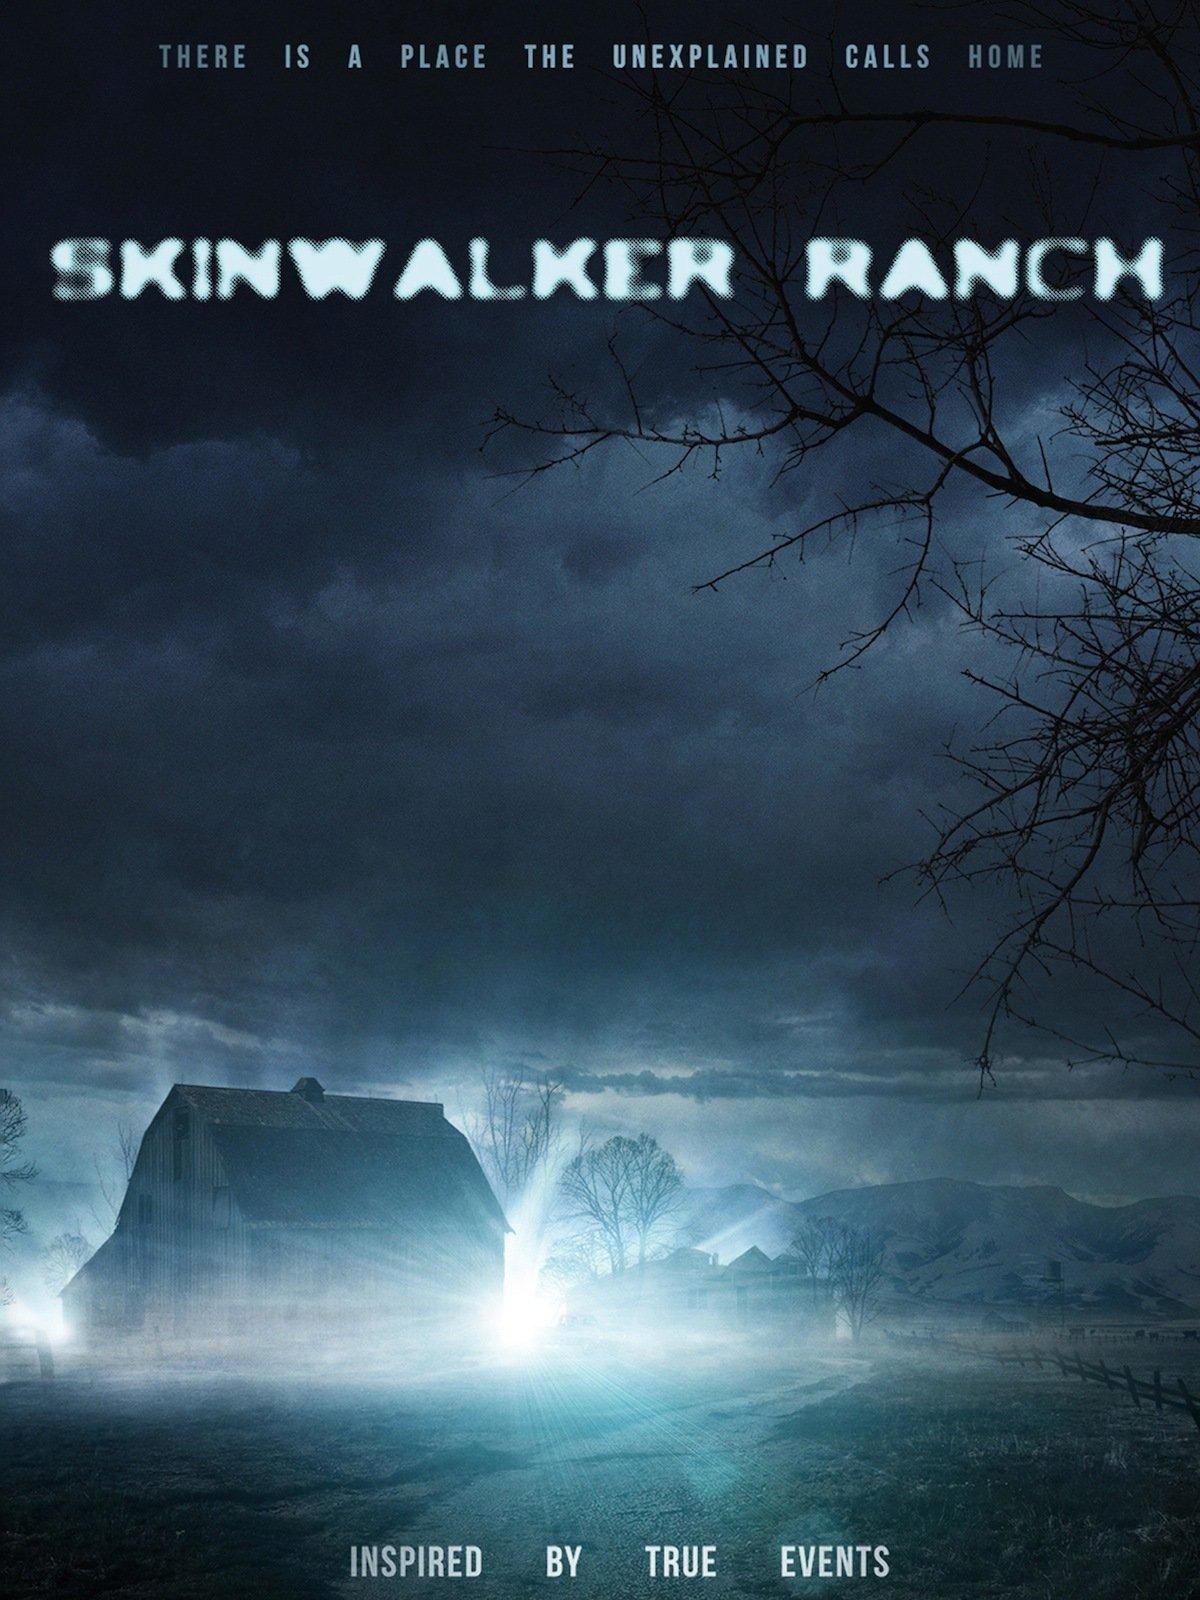 Amazon.com: Skinwalker Ranch: Jon Gries, Matt Rocheleau, Erin Cahill, Kyle Davis: Amazon Digital Services LLC